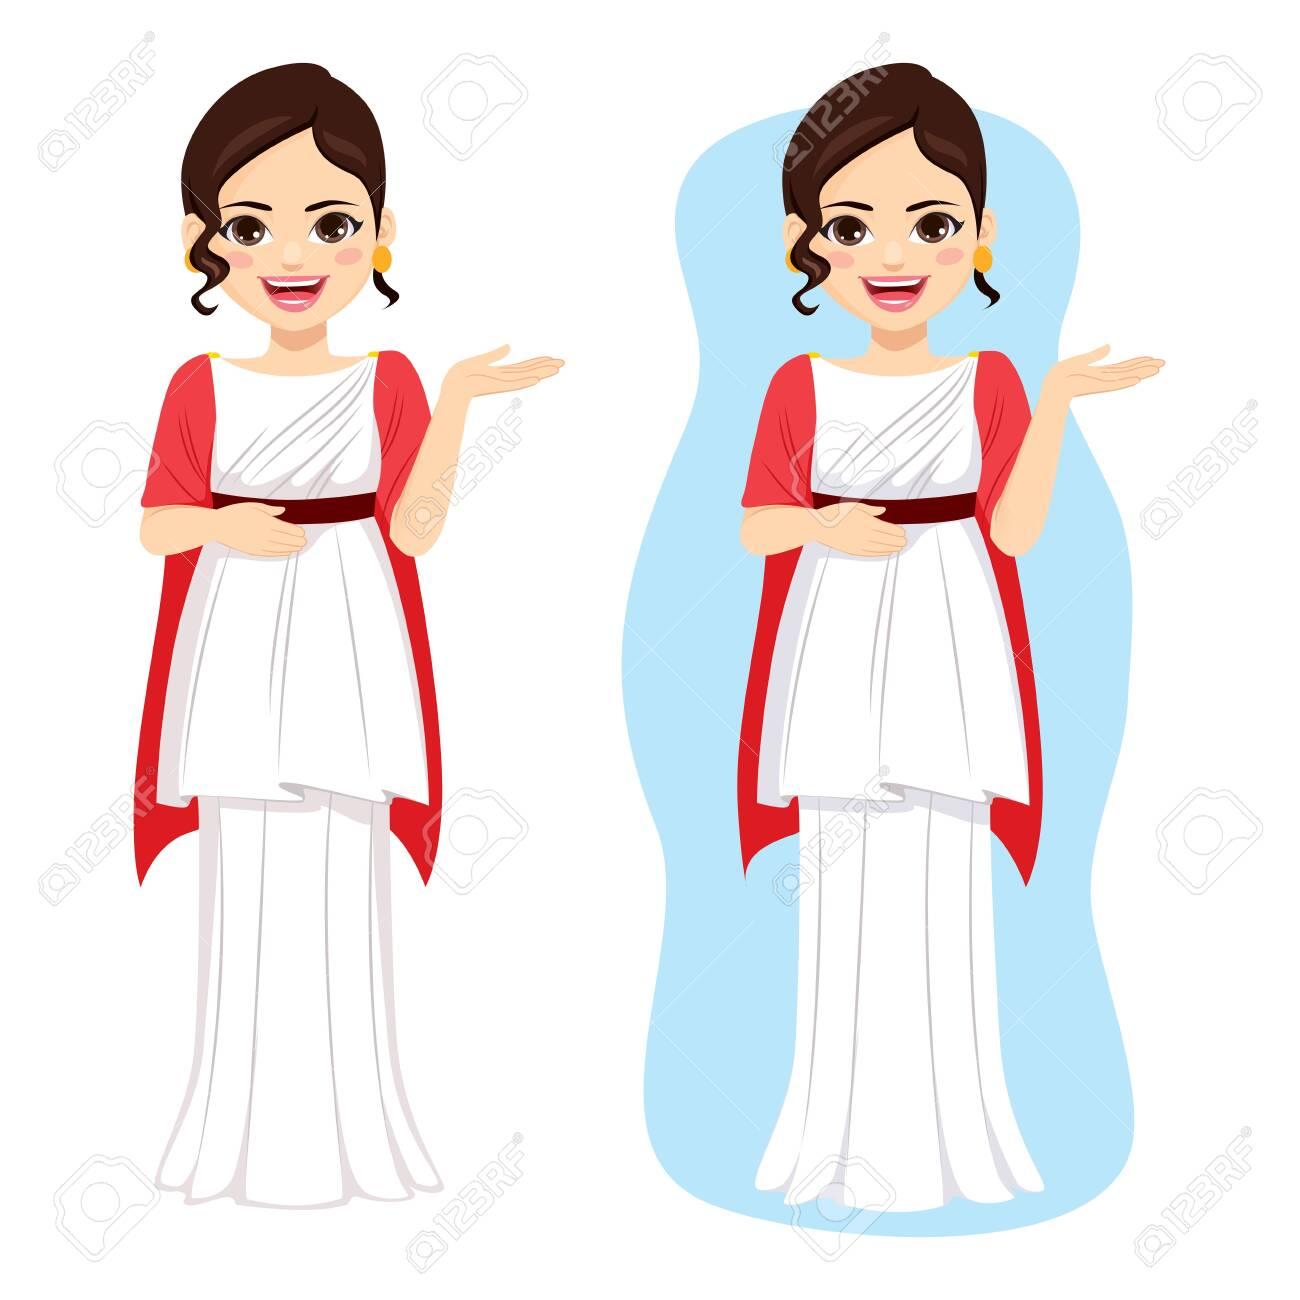 Beautiful young elegant roman woman with classic fashion Rome history dress - 129388477